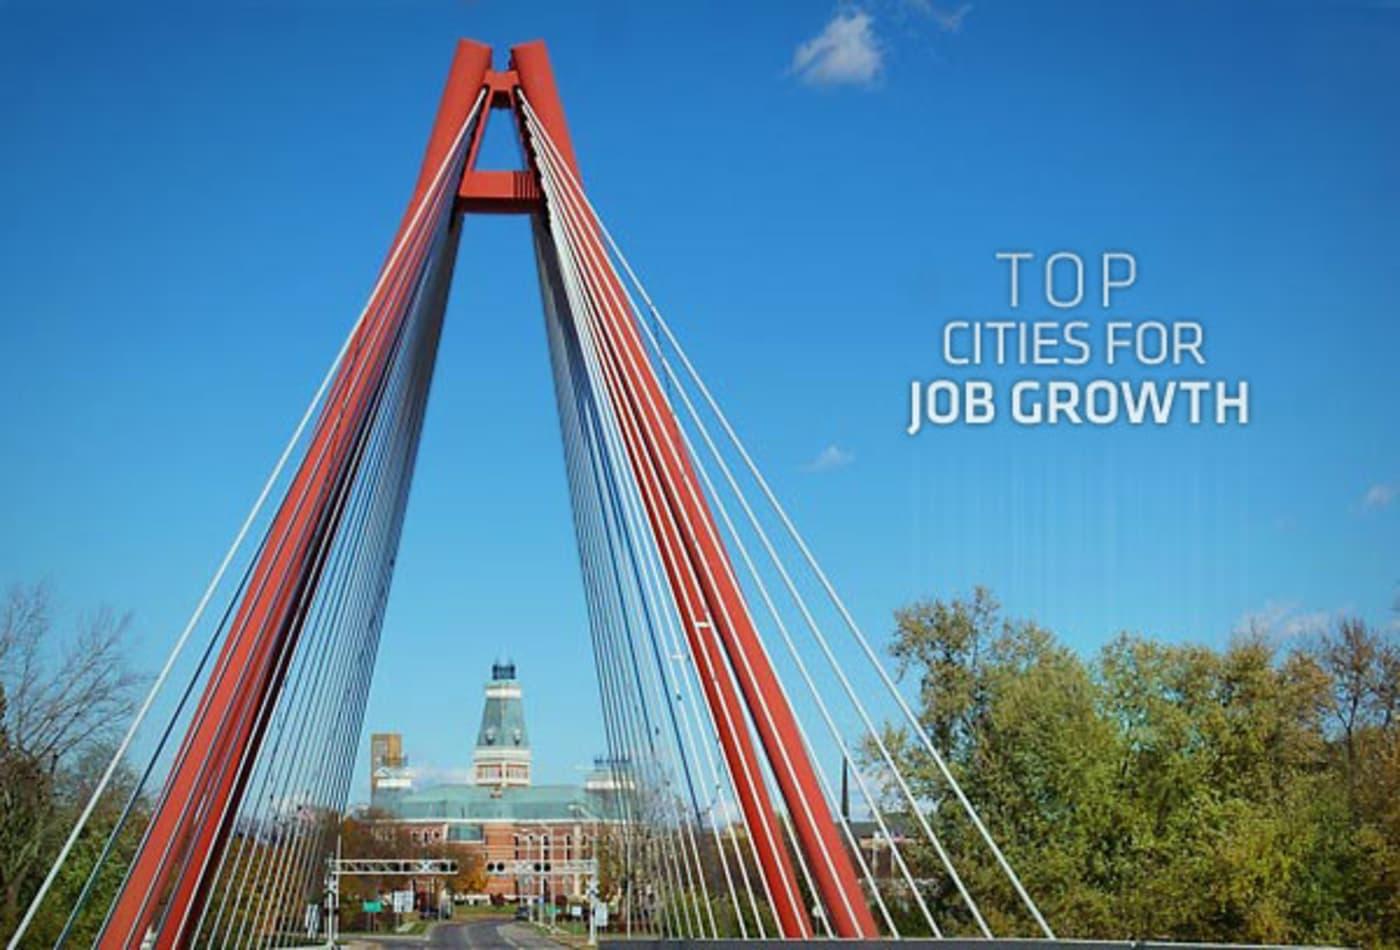 Cover-Columbus-Indiana-Cities-Top-Job-Growth-CNBC.jpg